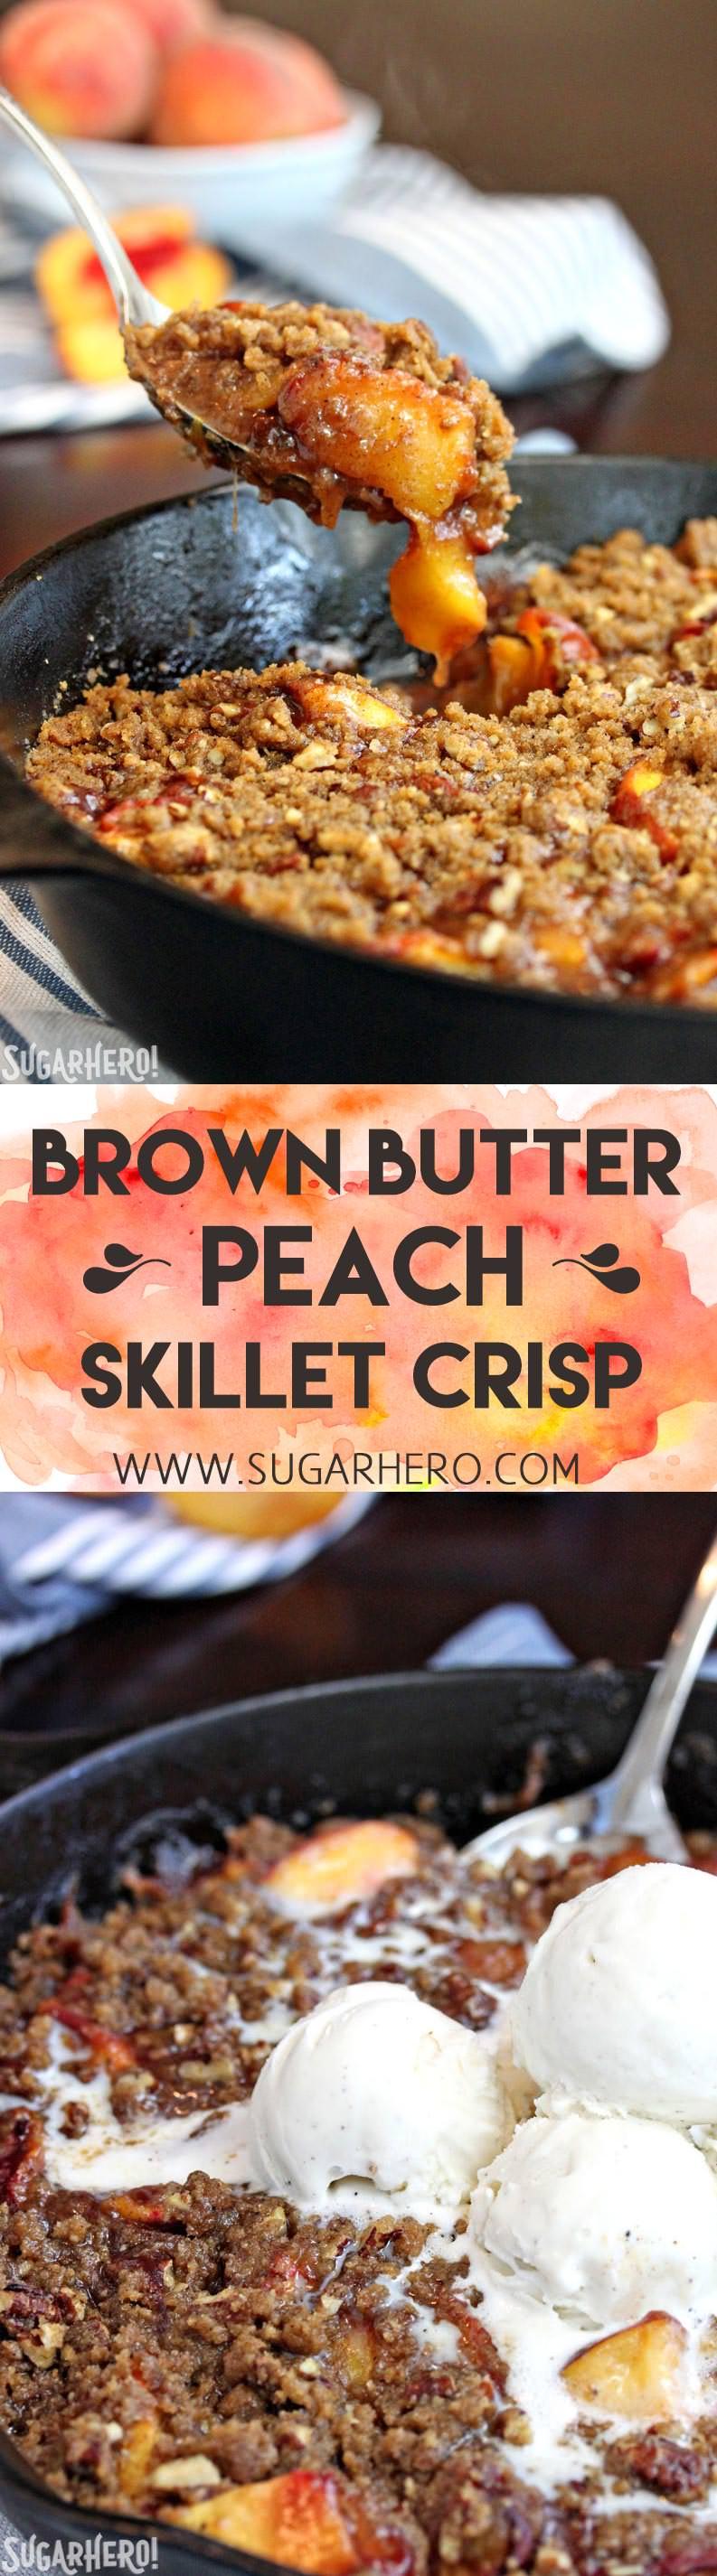 Brown Butter Skillet Peach Crisp | From SugarHero.com